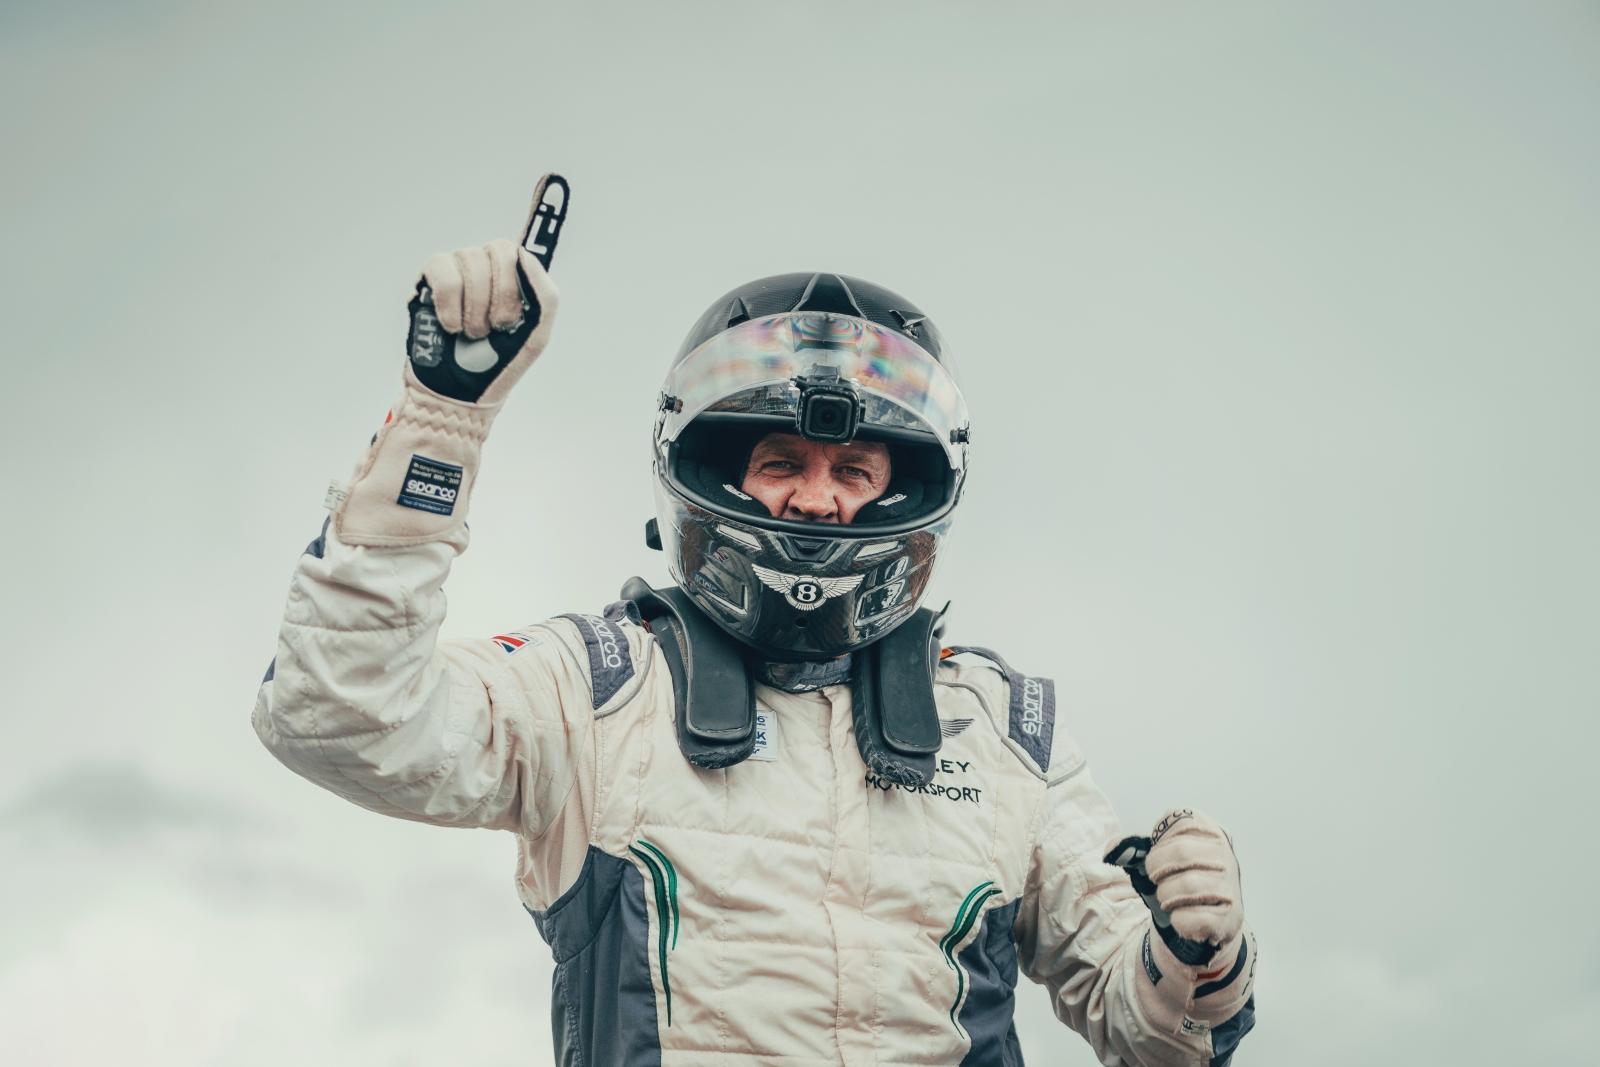 Rhys Millen új Pikes Peak rekord